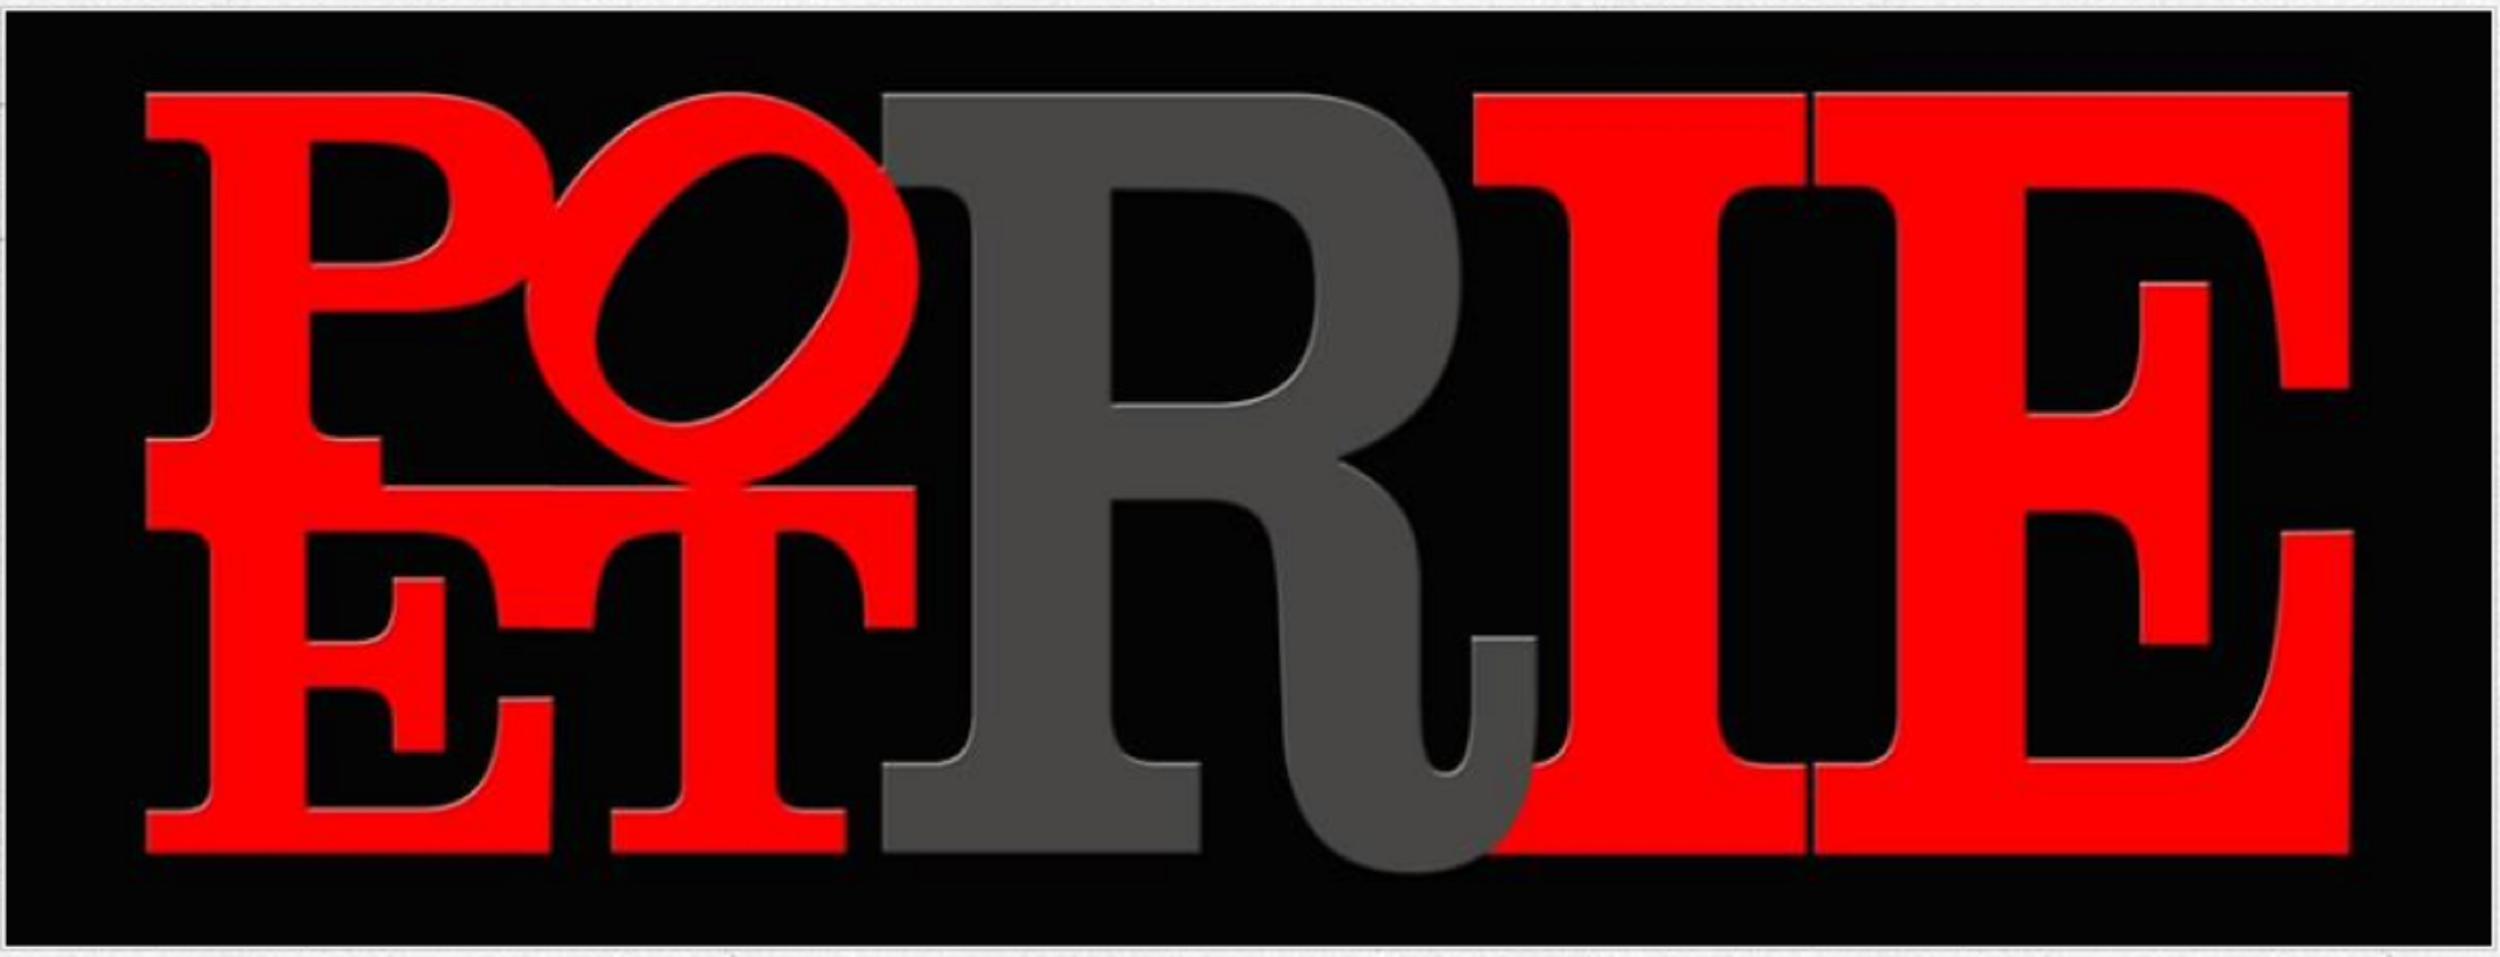 poetrIE logo.png